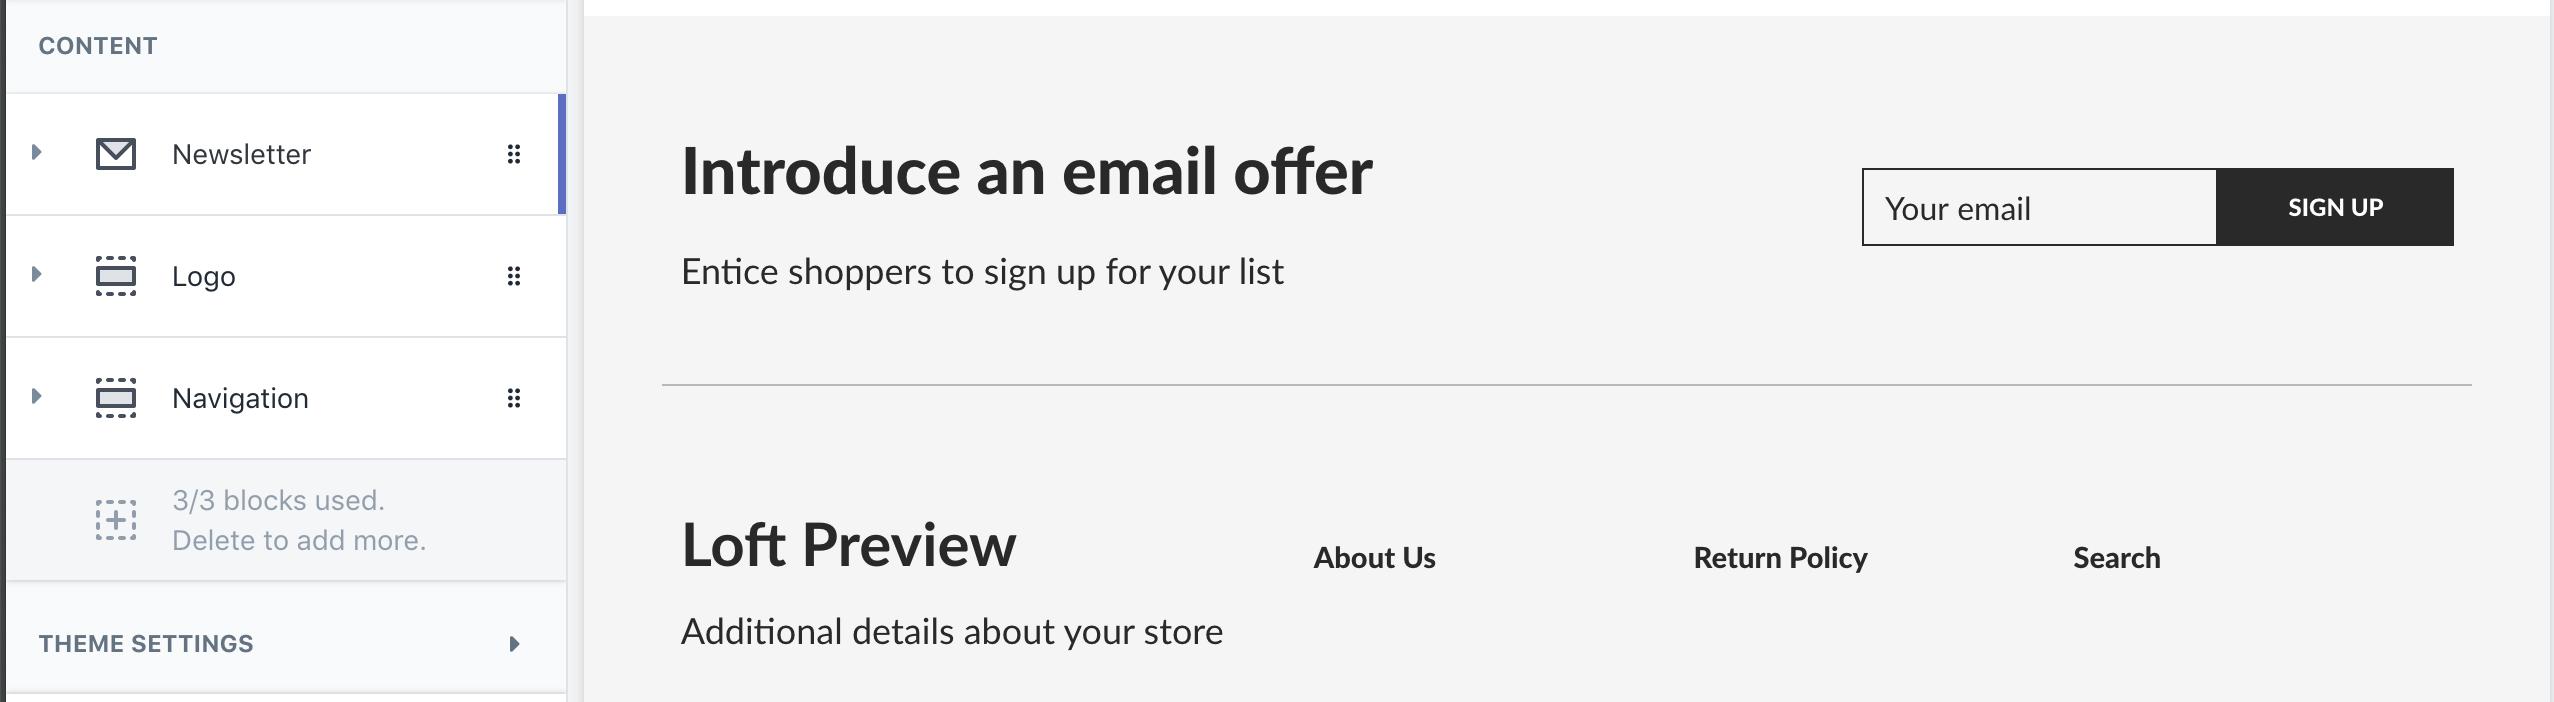 Newsletter block above the logo and navigation blocks